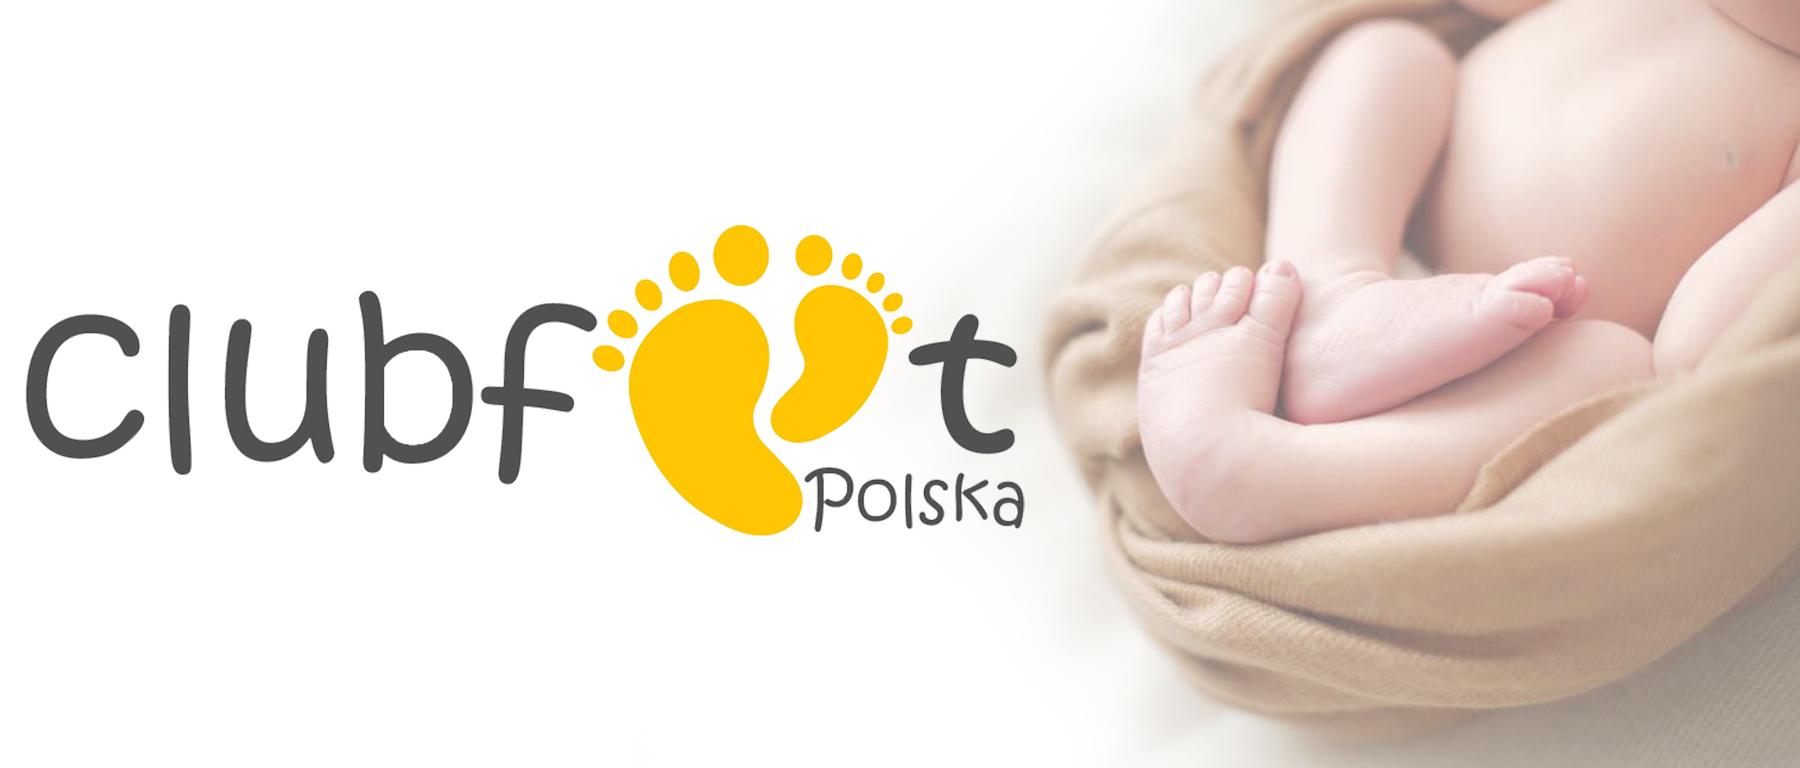 Clubfoot Polska